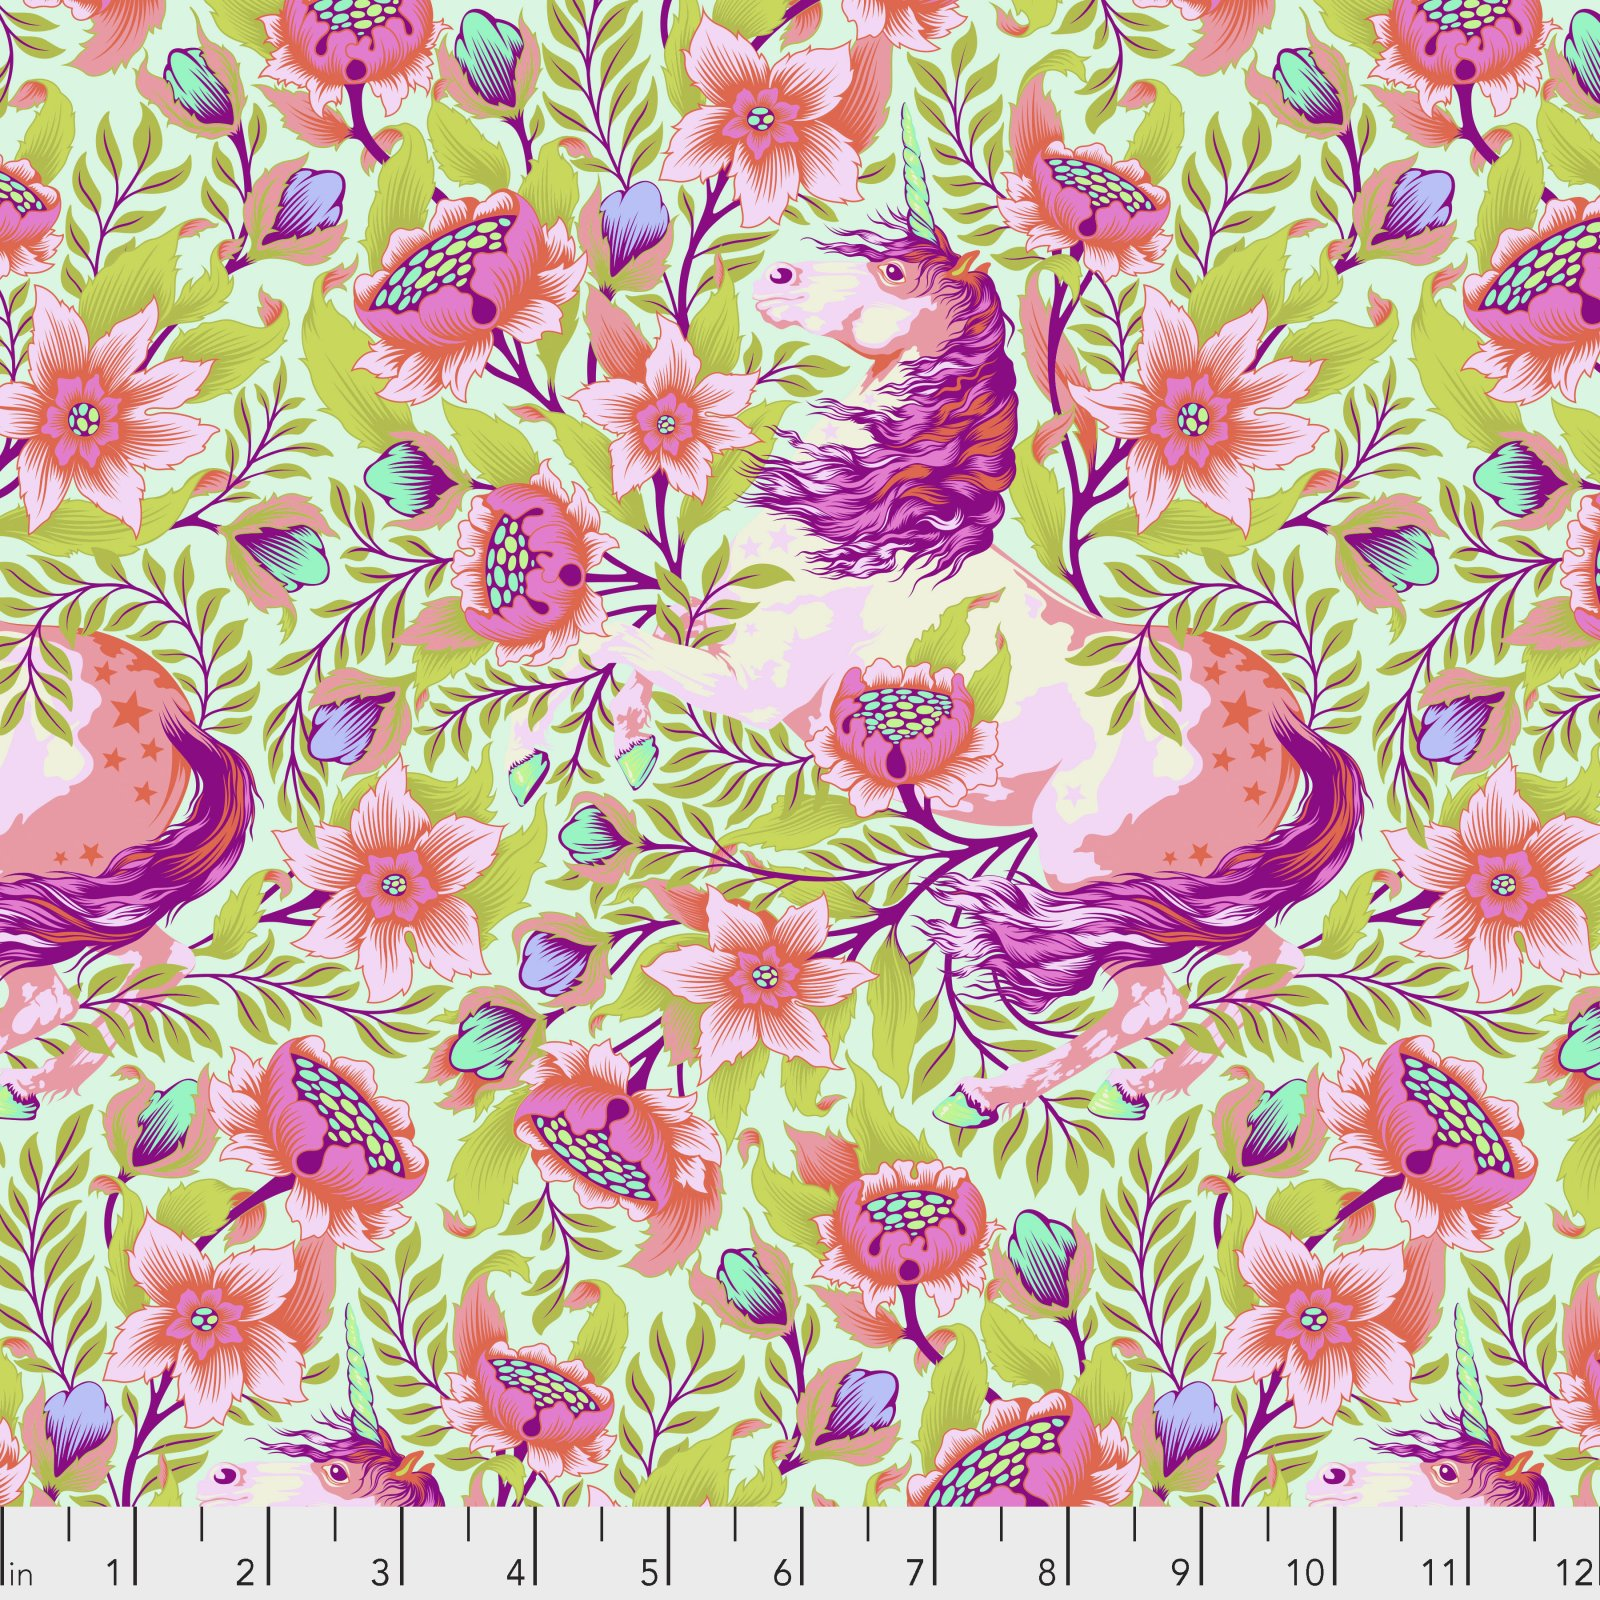 Pinkervillle Imaginarium in Cotton Candy